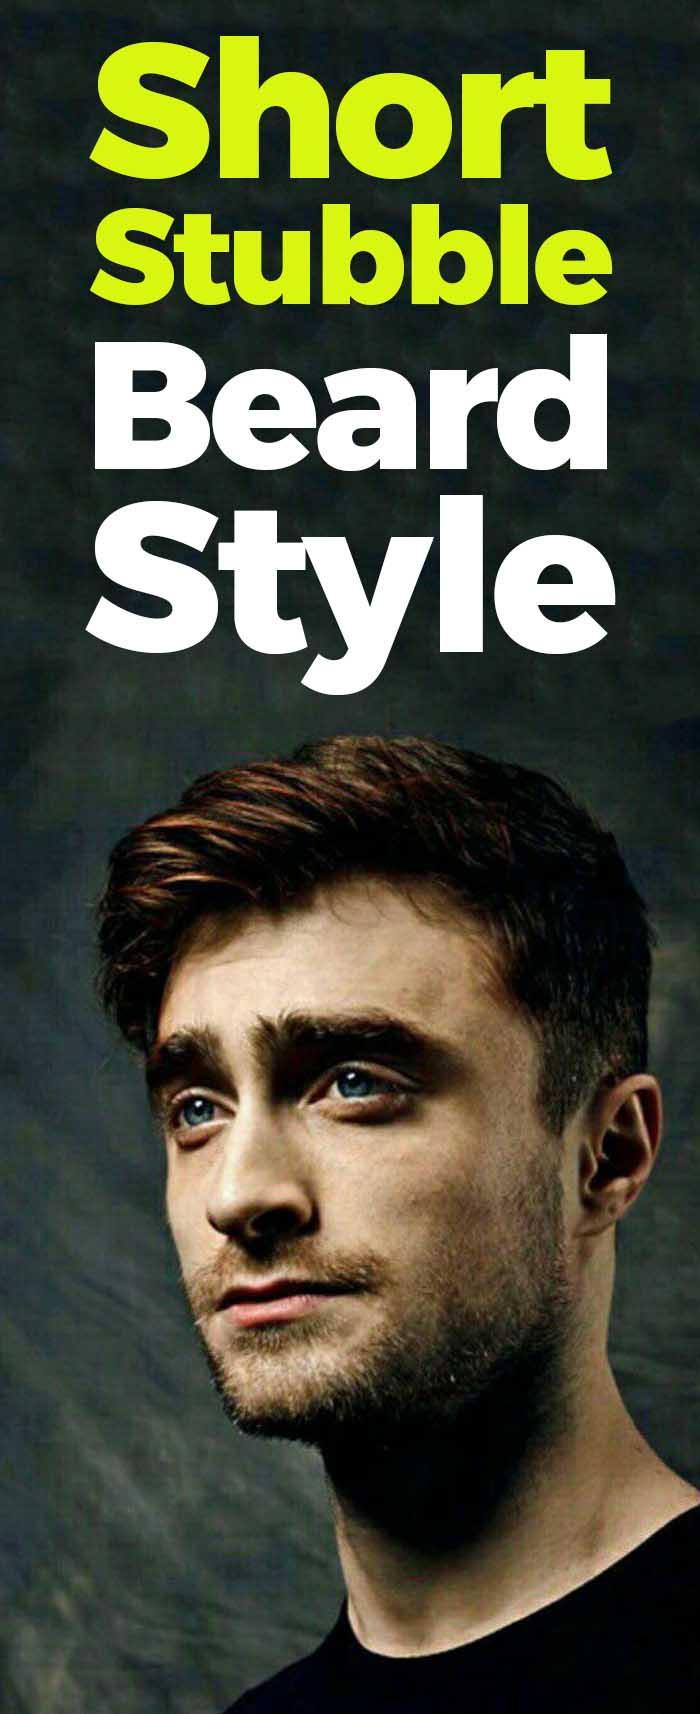 Daniel Radcliffe short beard style!